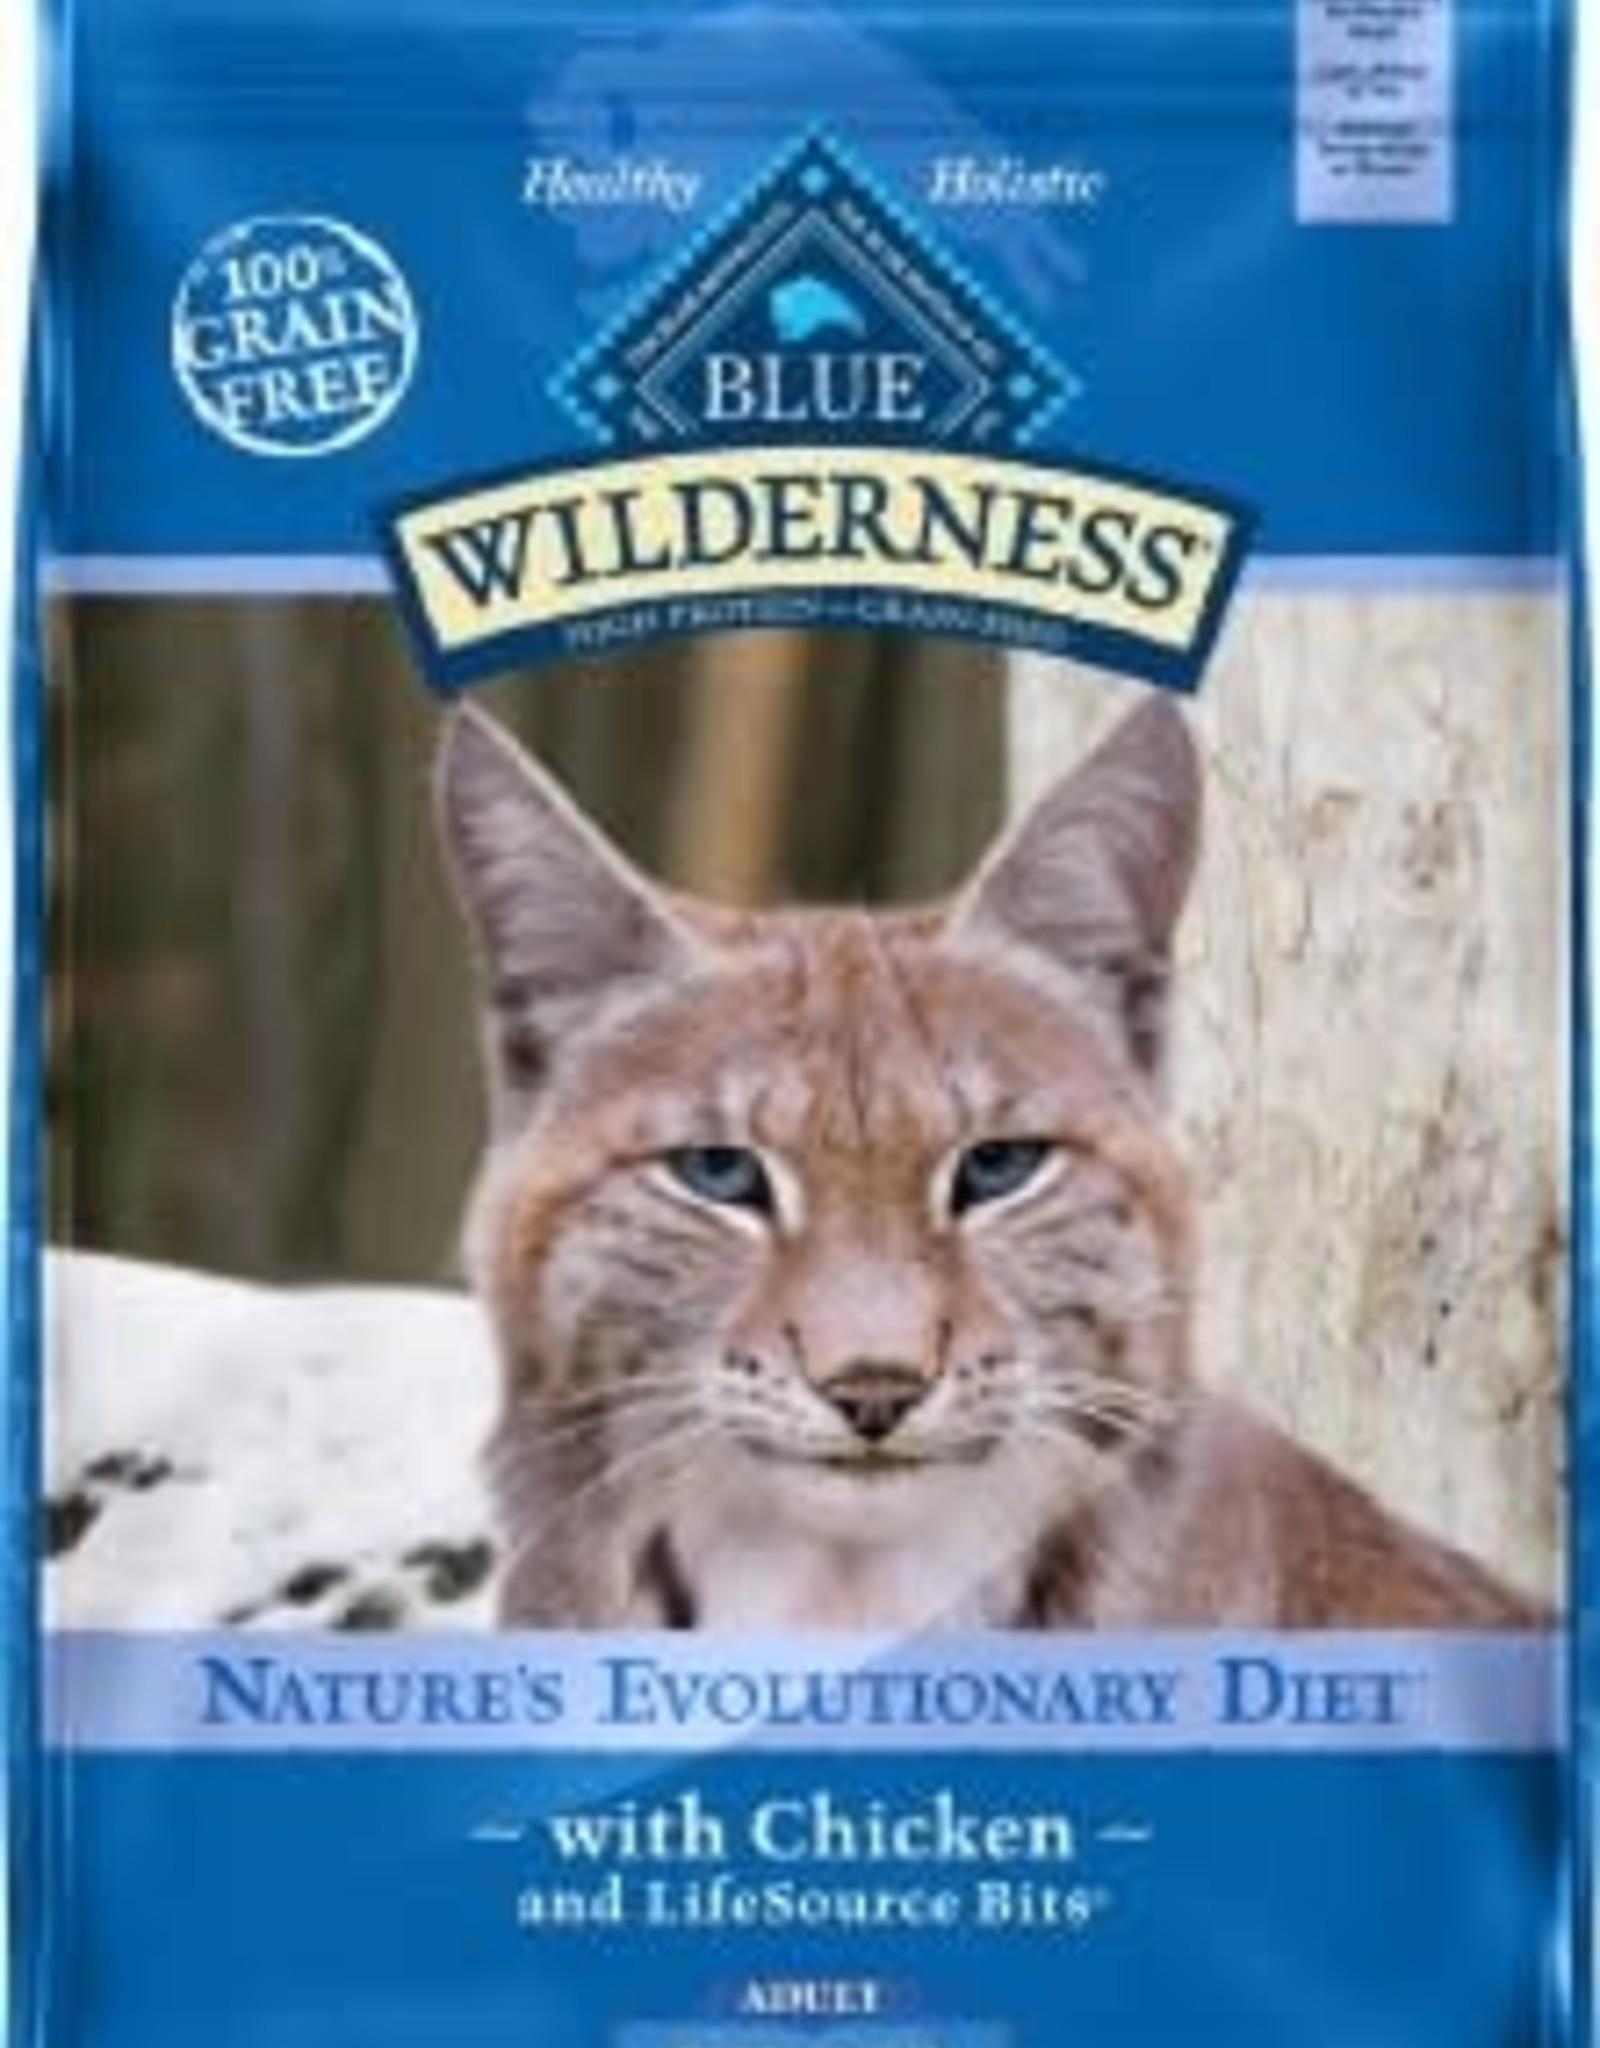 Blue Buffalo BLUE BUFFALO CAT WILDERNESS ADULT INDOOR CHICKEN 11LB GRAIN FREE